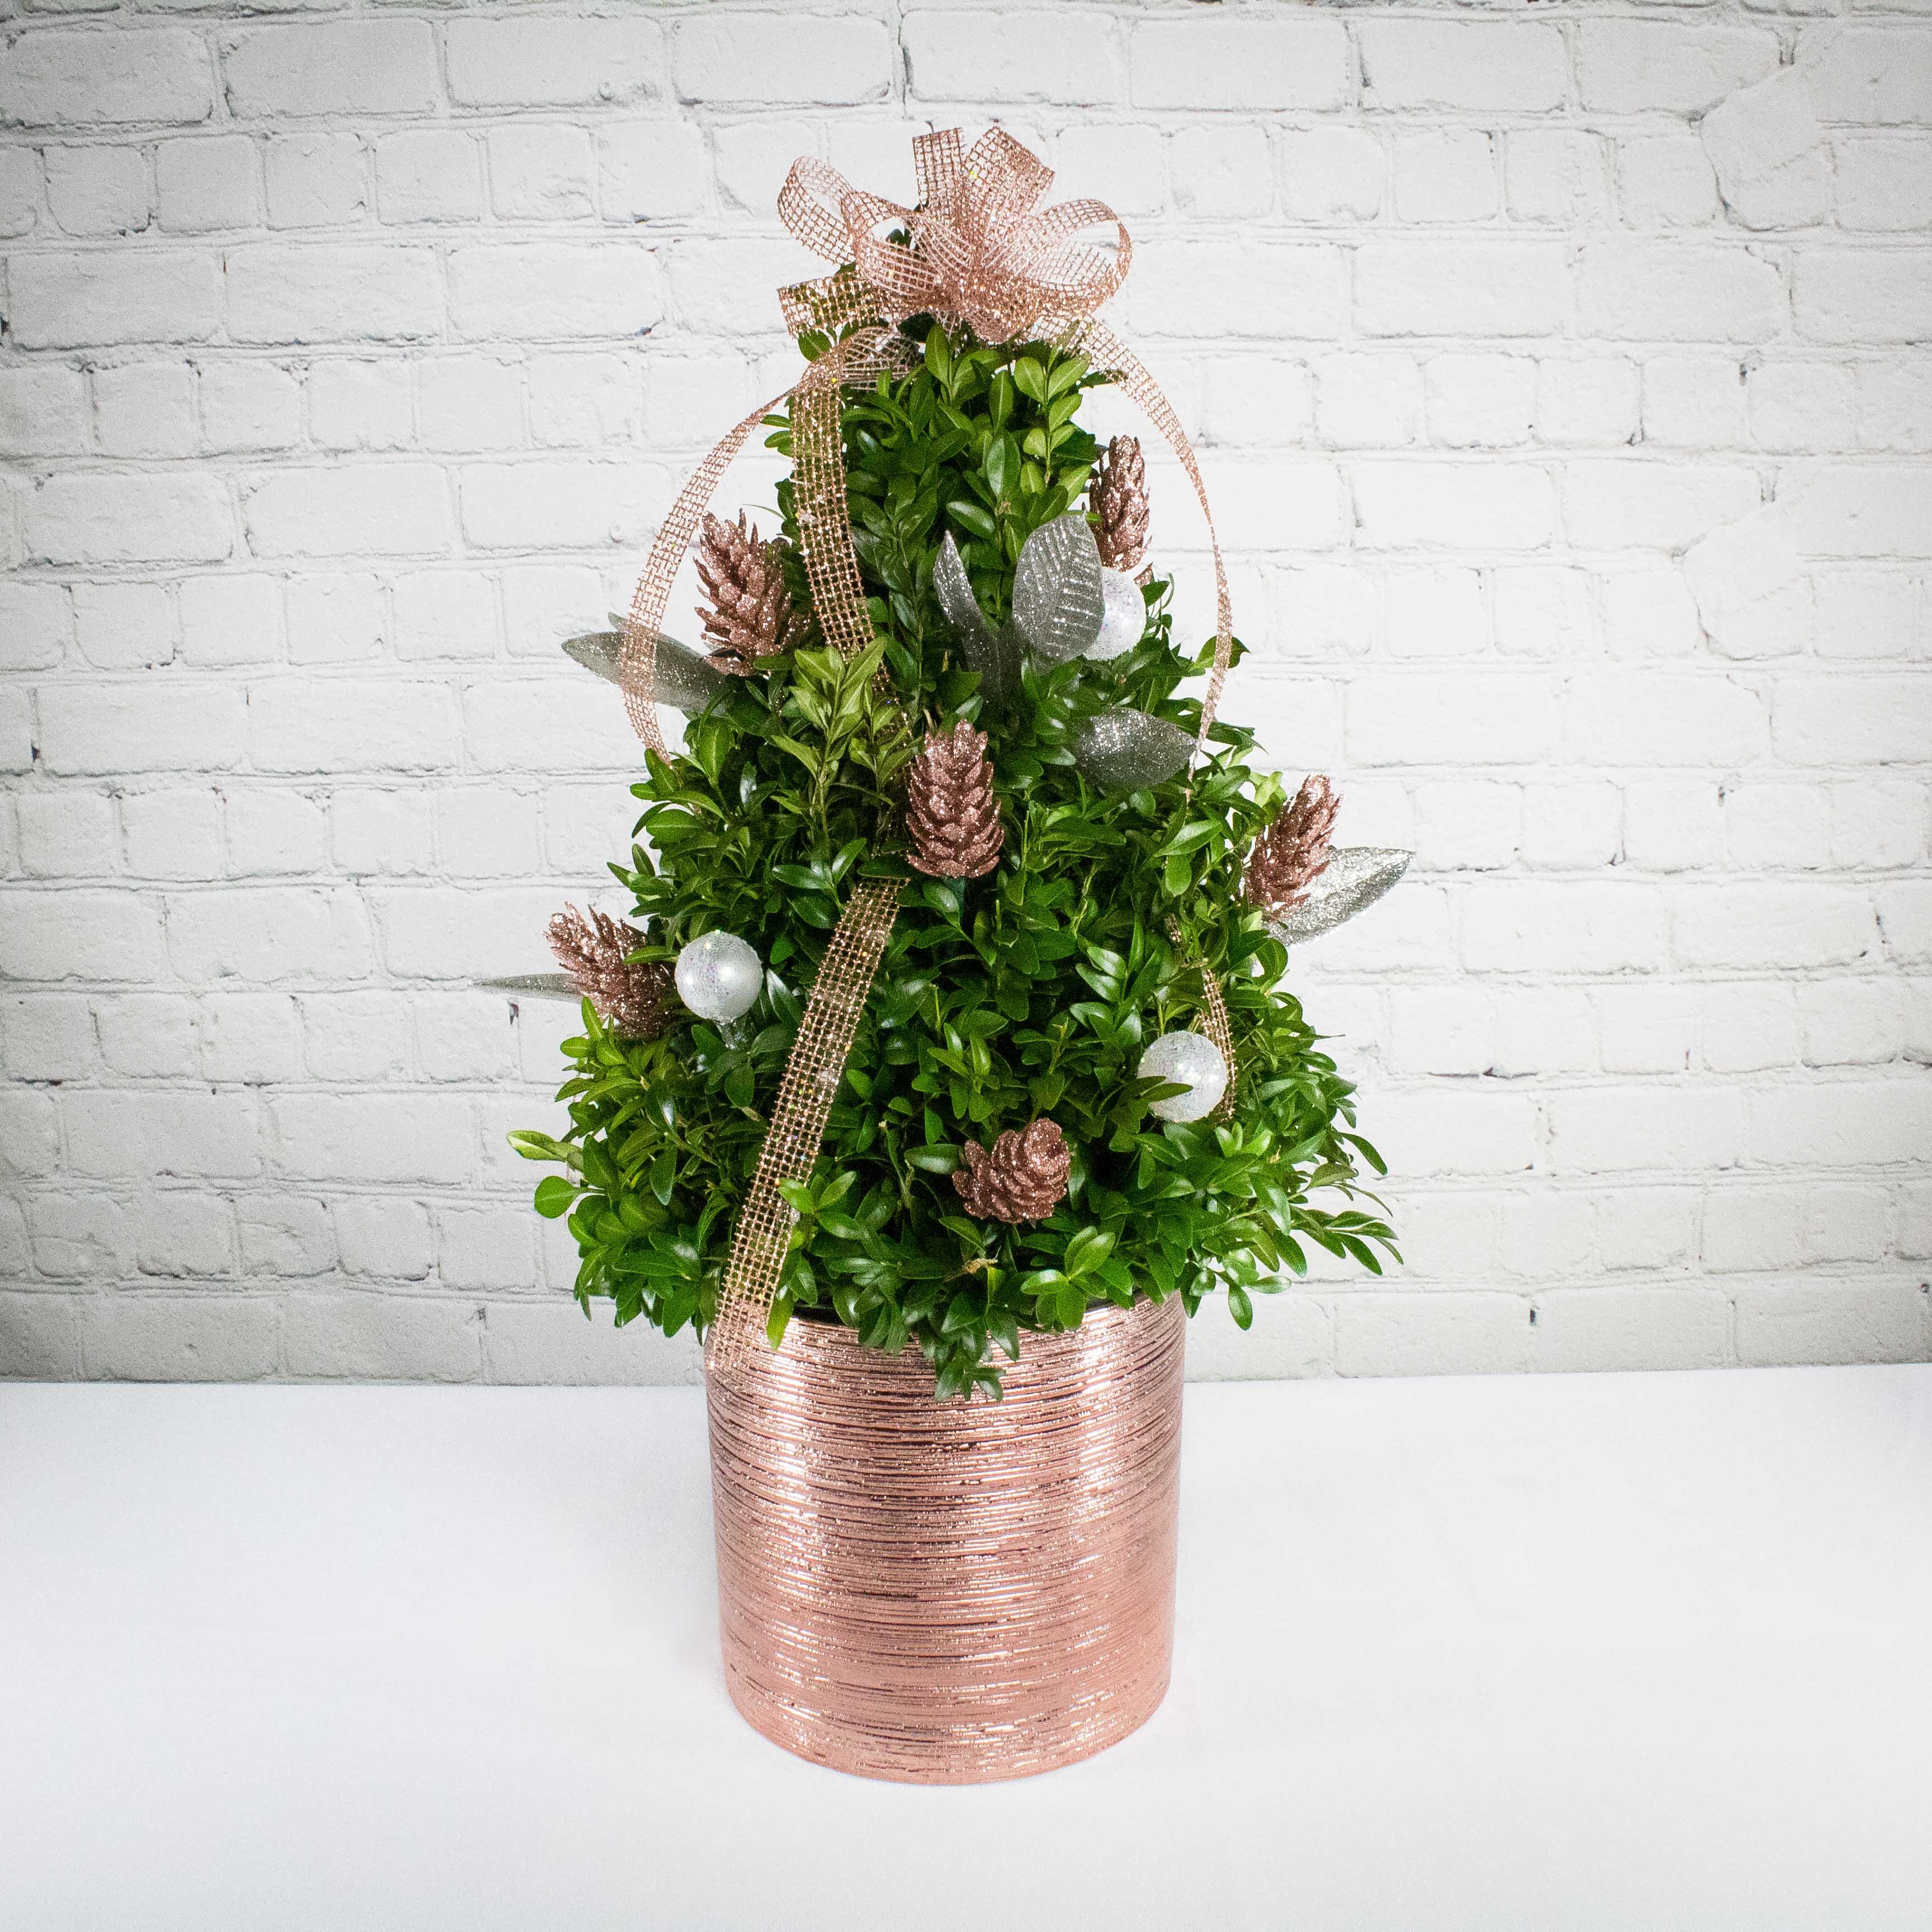 Rose Gold Mini Tree Ashland Addison Florist Co